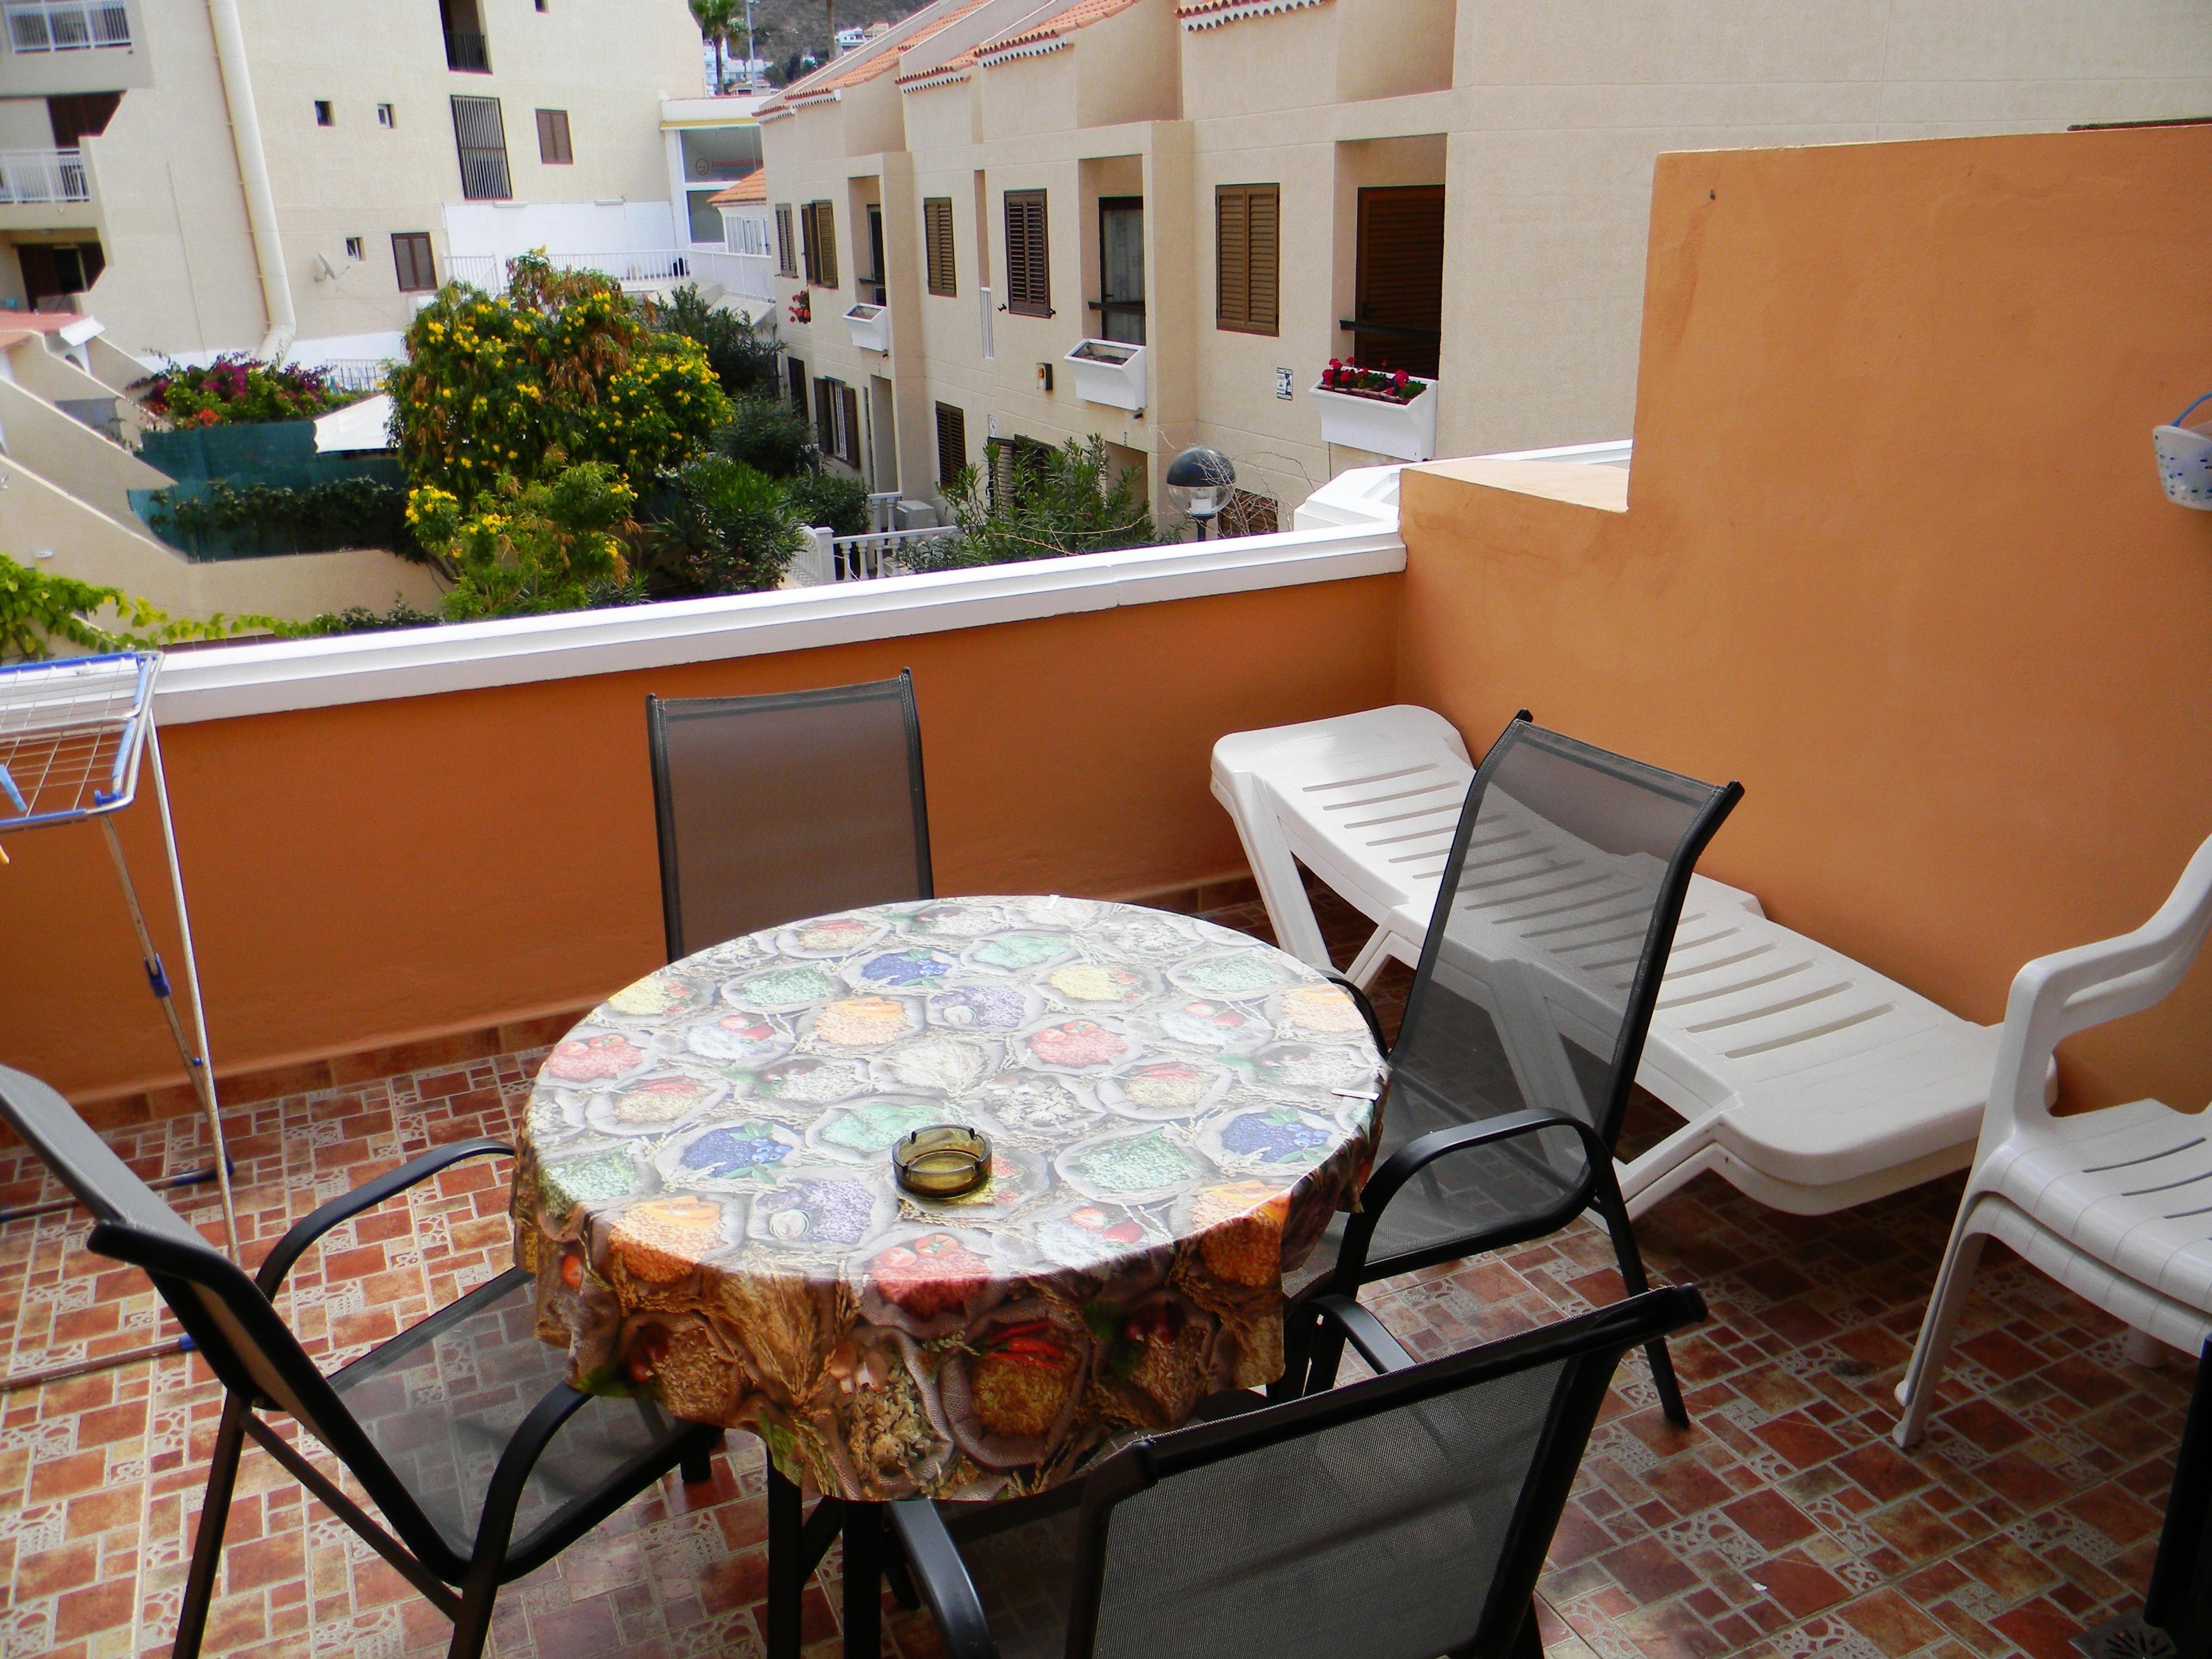 Studio Apartment (Ref 14), Tenerife Royal Gardens, Tenerife.